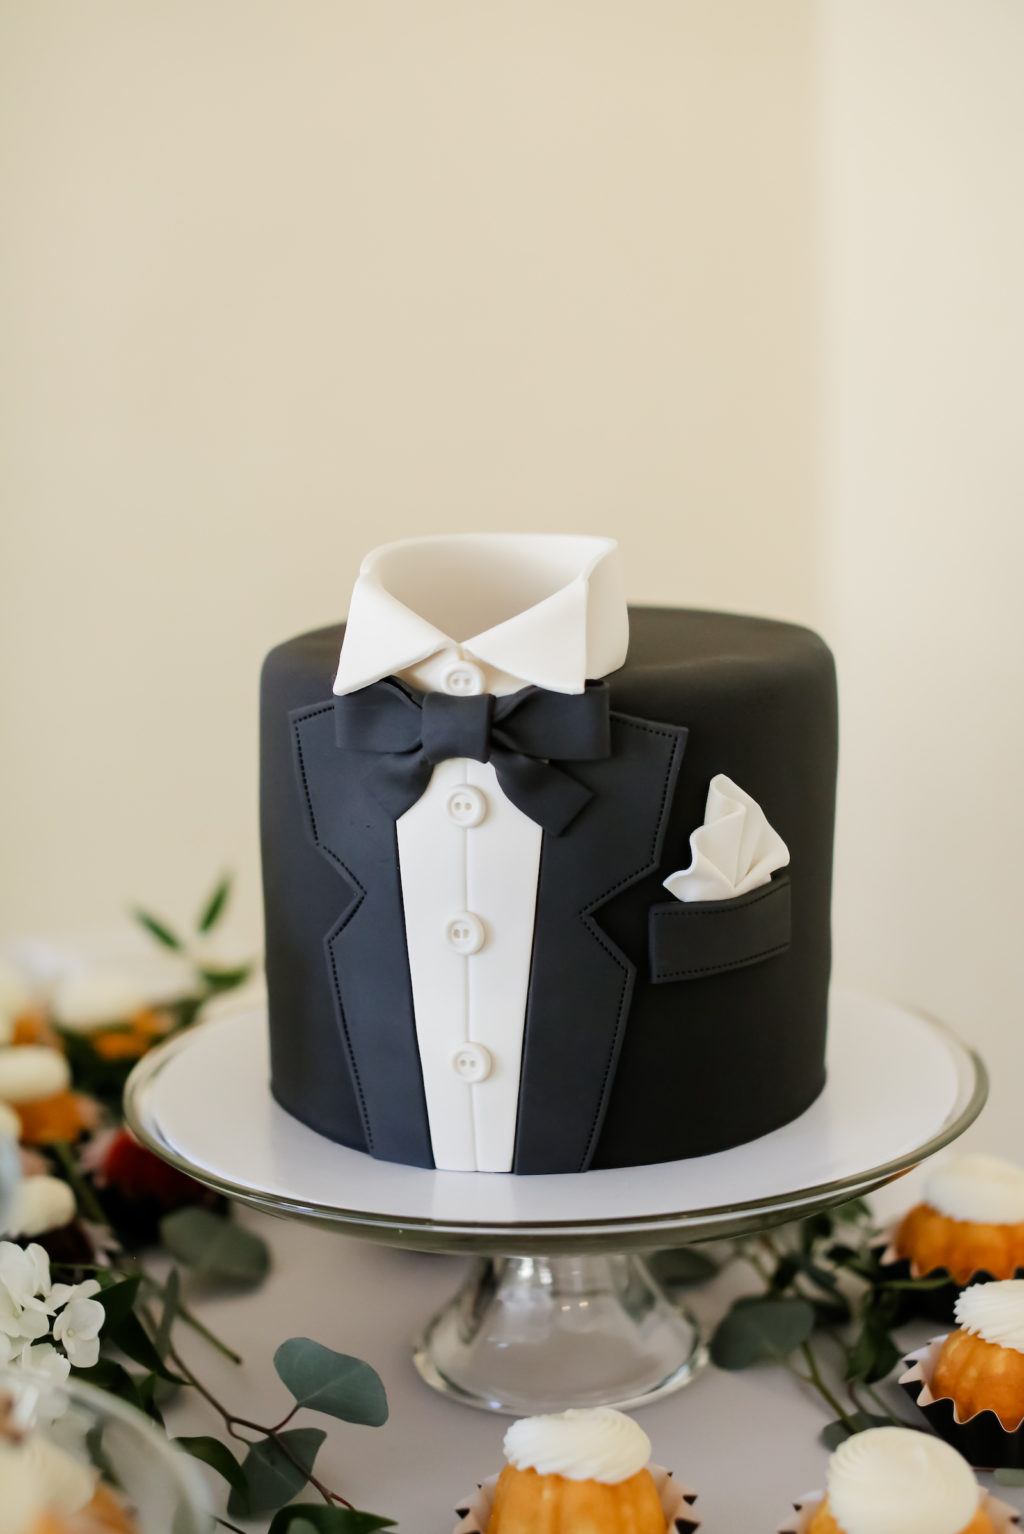 Unique Custom Tuxedo Shaped Grooms Cake | Tampa Bay Wedding Photographer Lifelong Photography Studio | Wedding Cake The Cake Girl